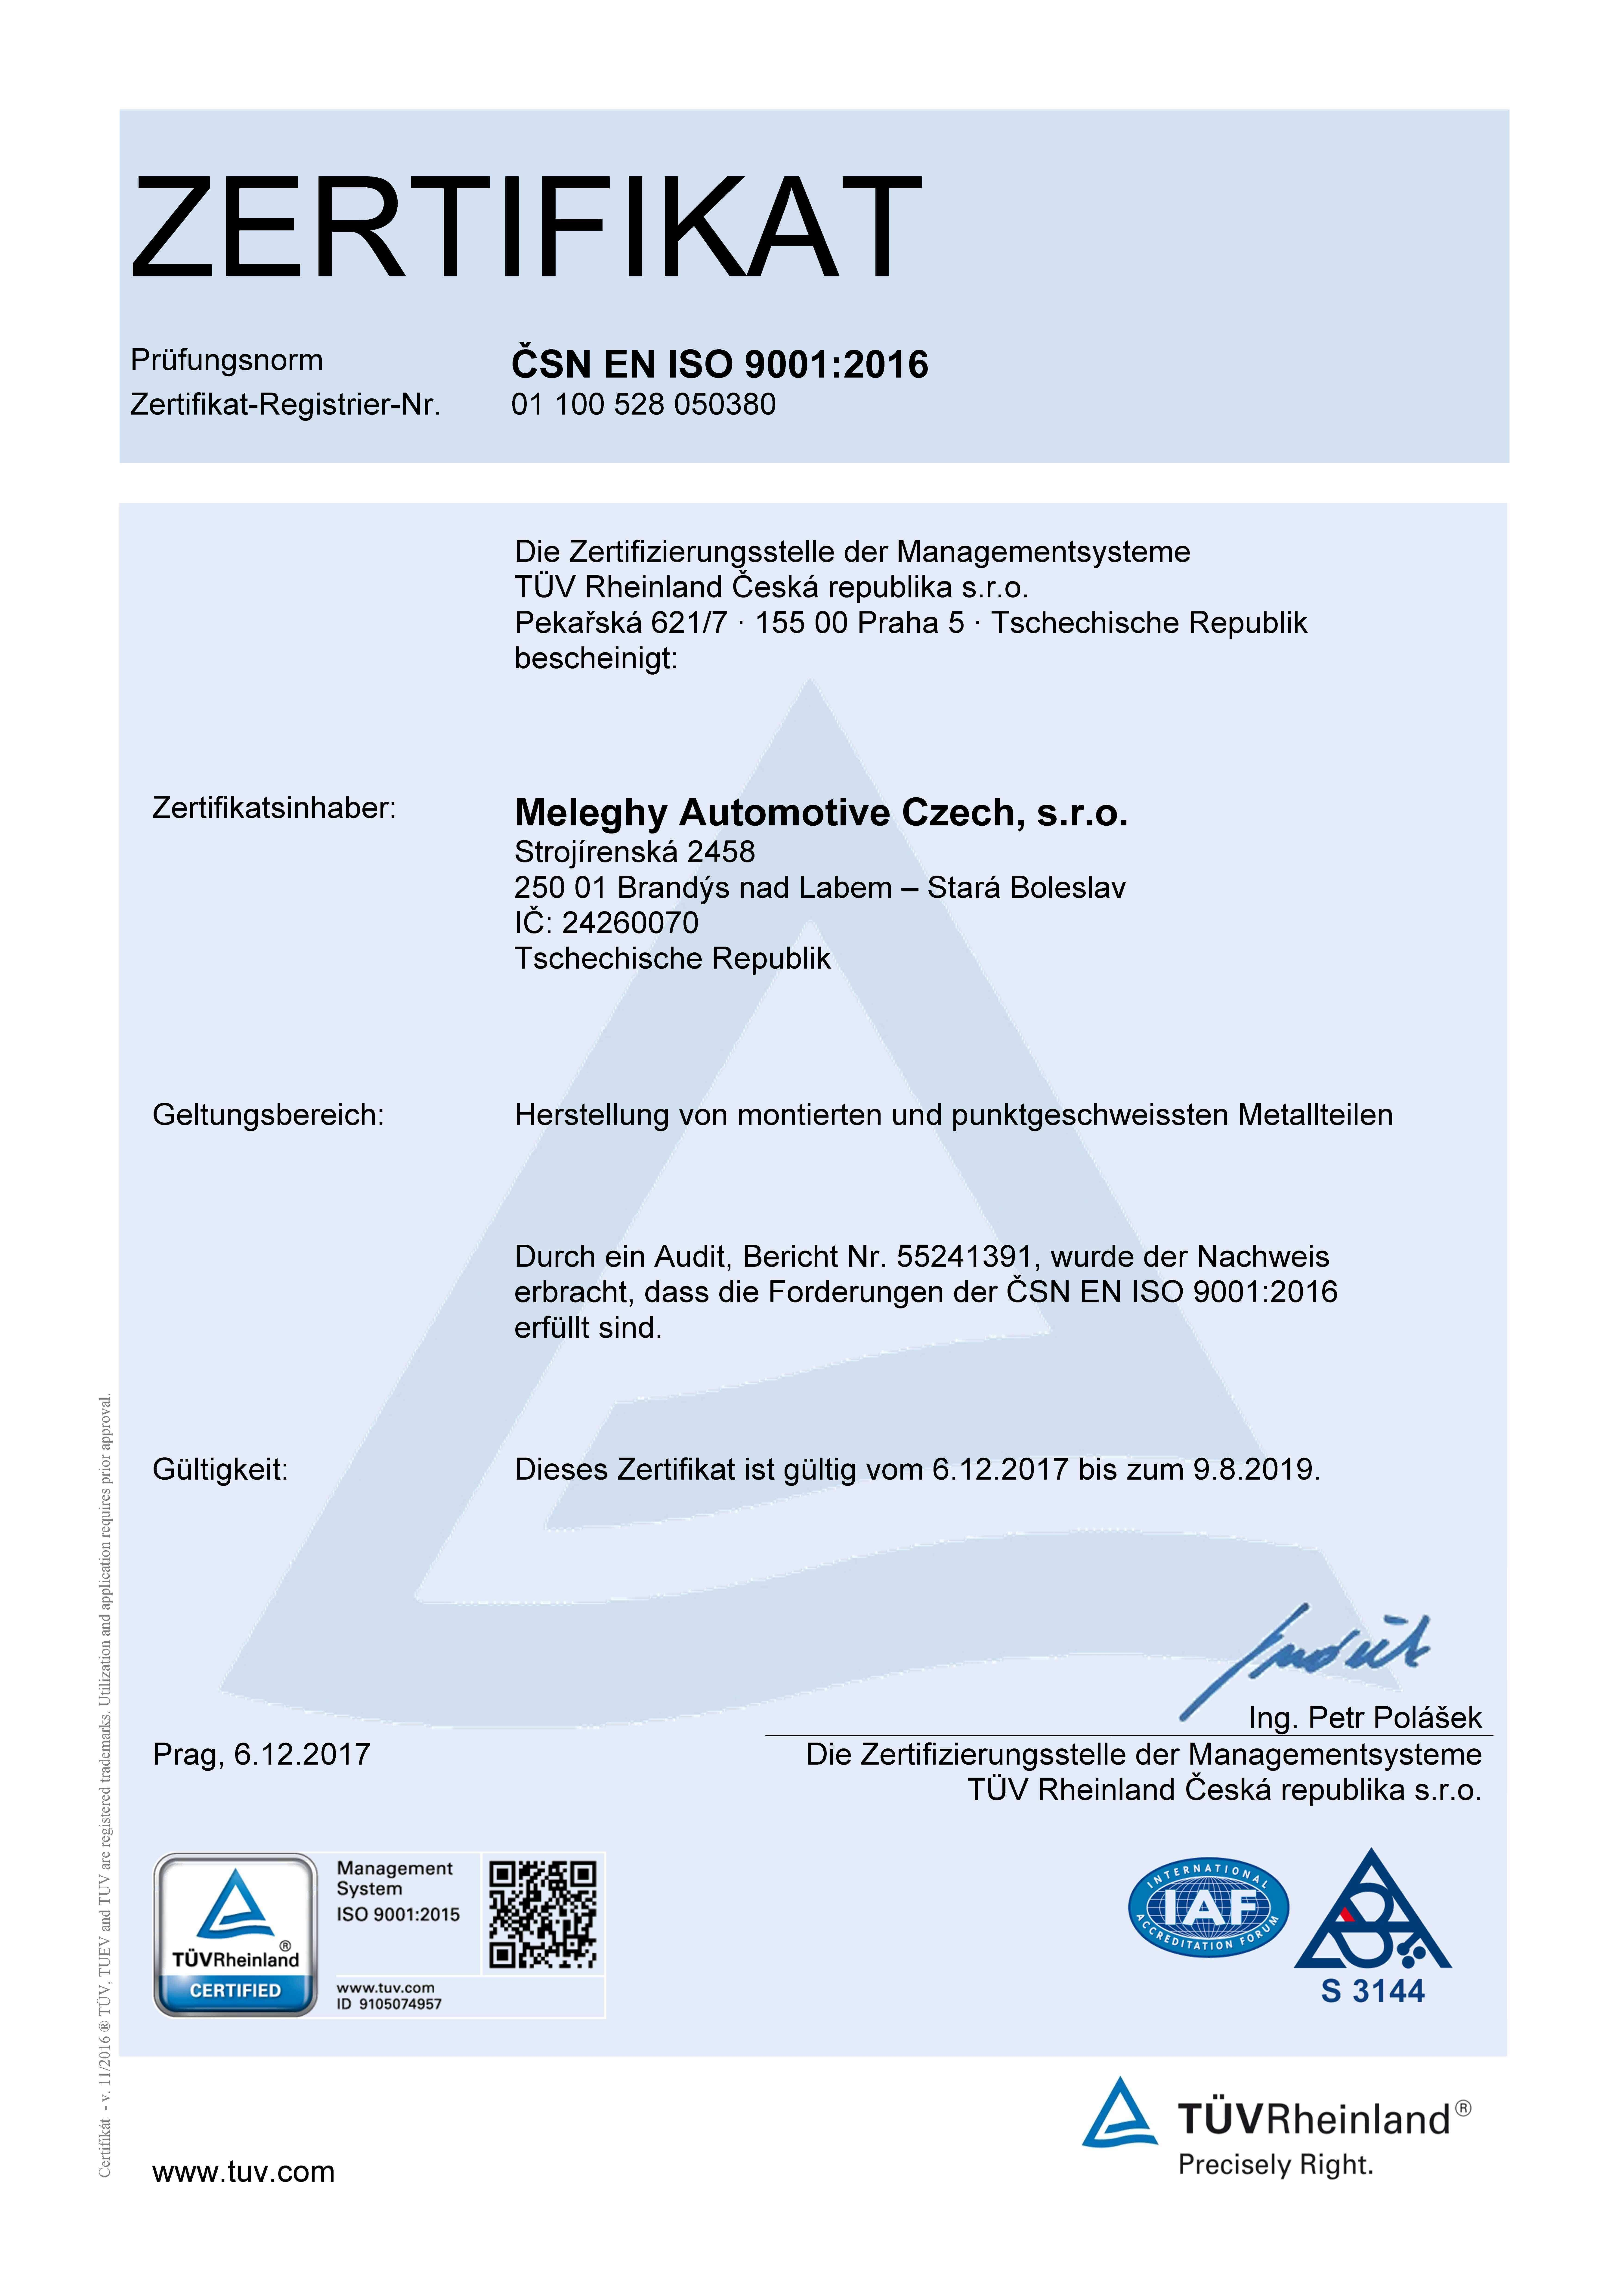 Meleghy Automotive Brandys Zertifikat DE ISO 9001 2016